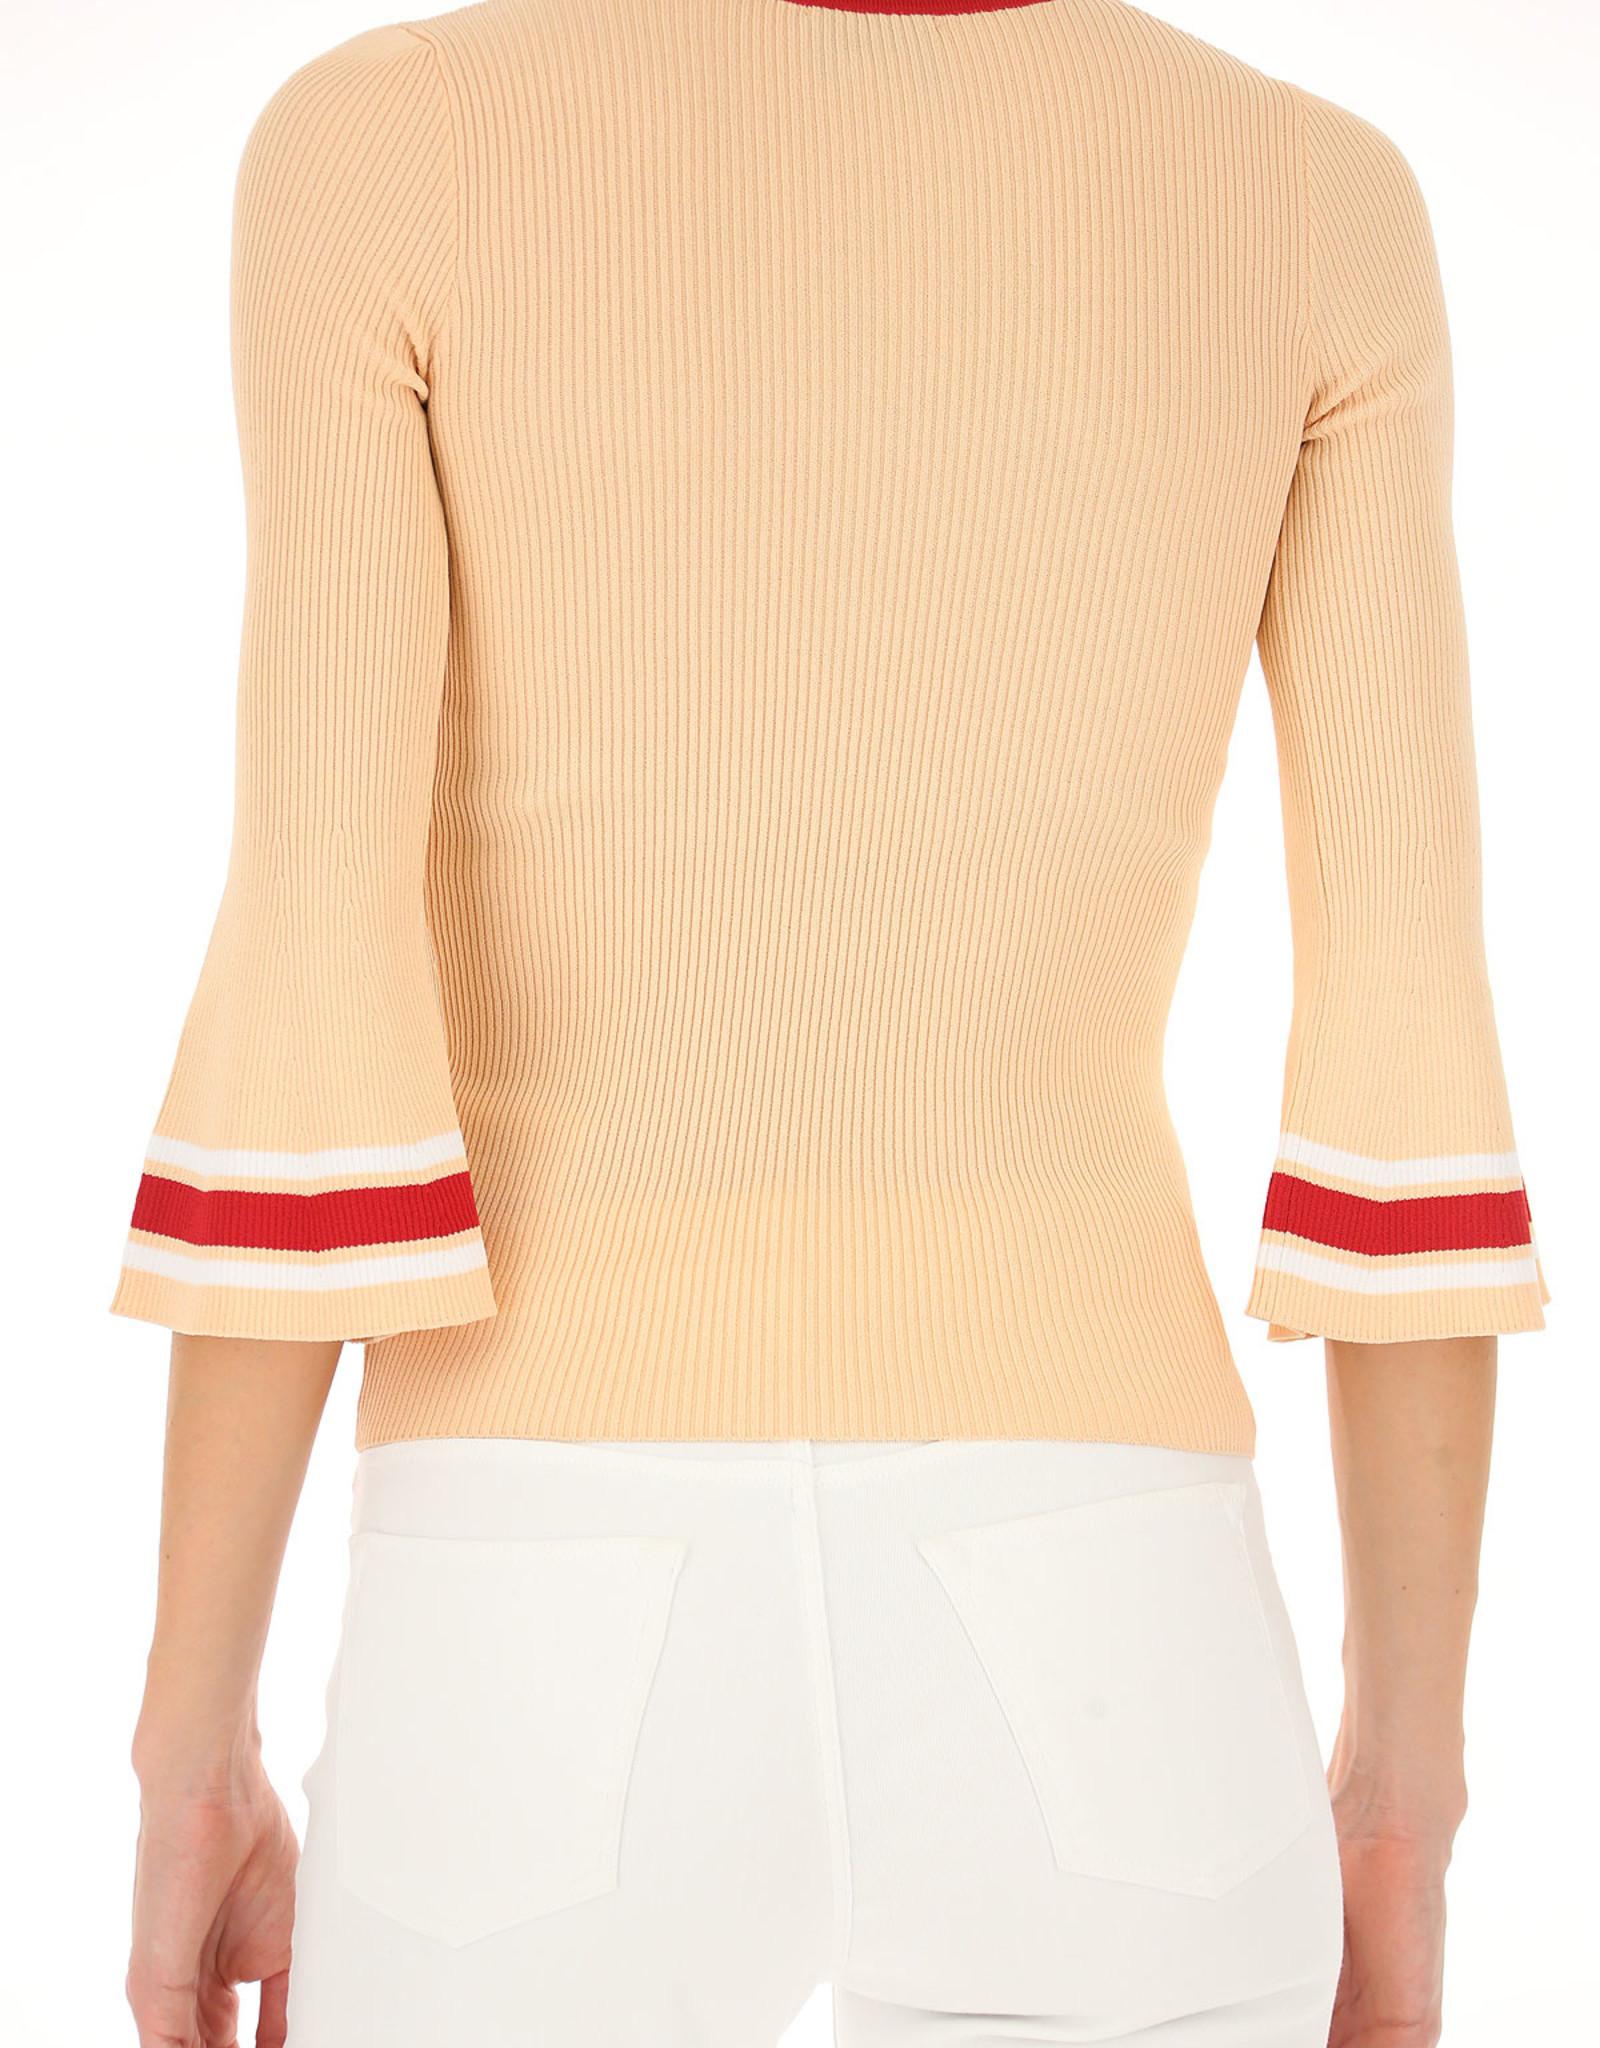 Elisabetta Franchi Women's Knitted Sweater MK36B92E2